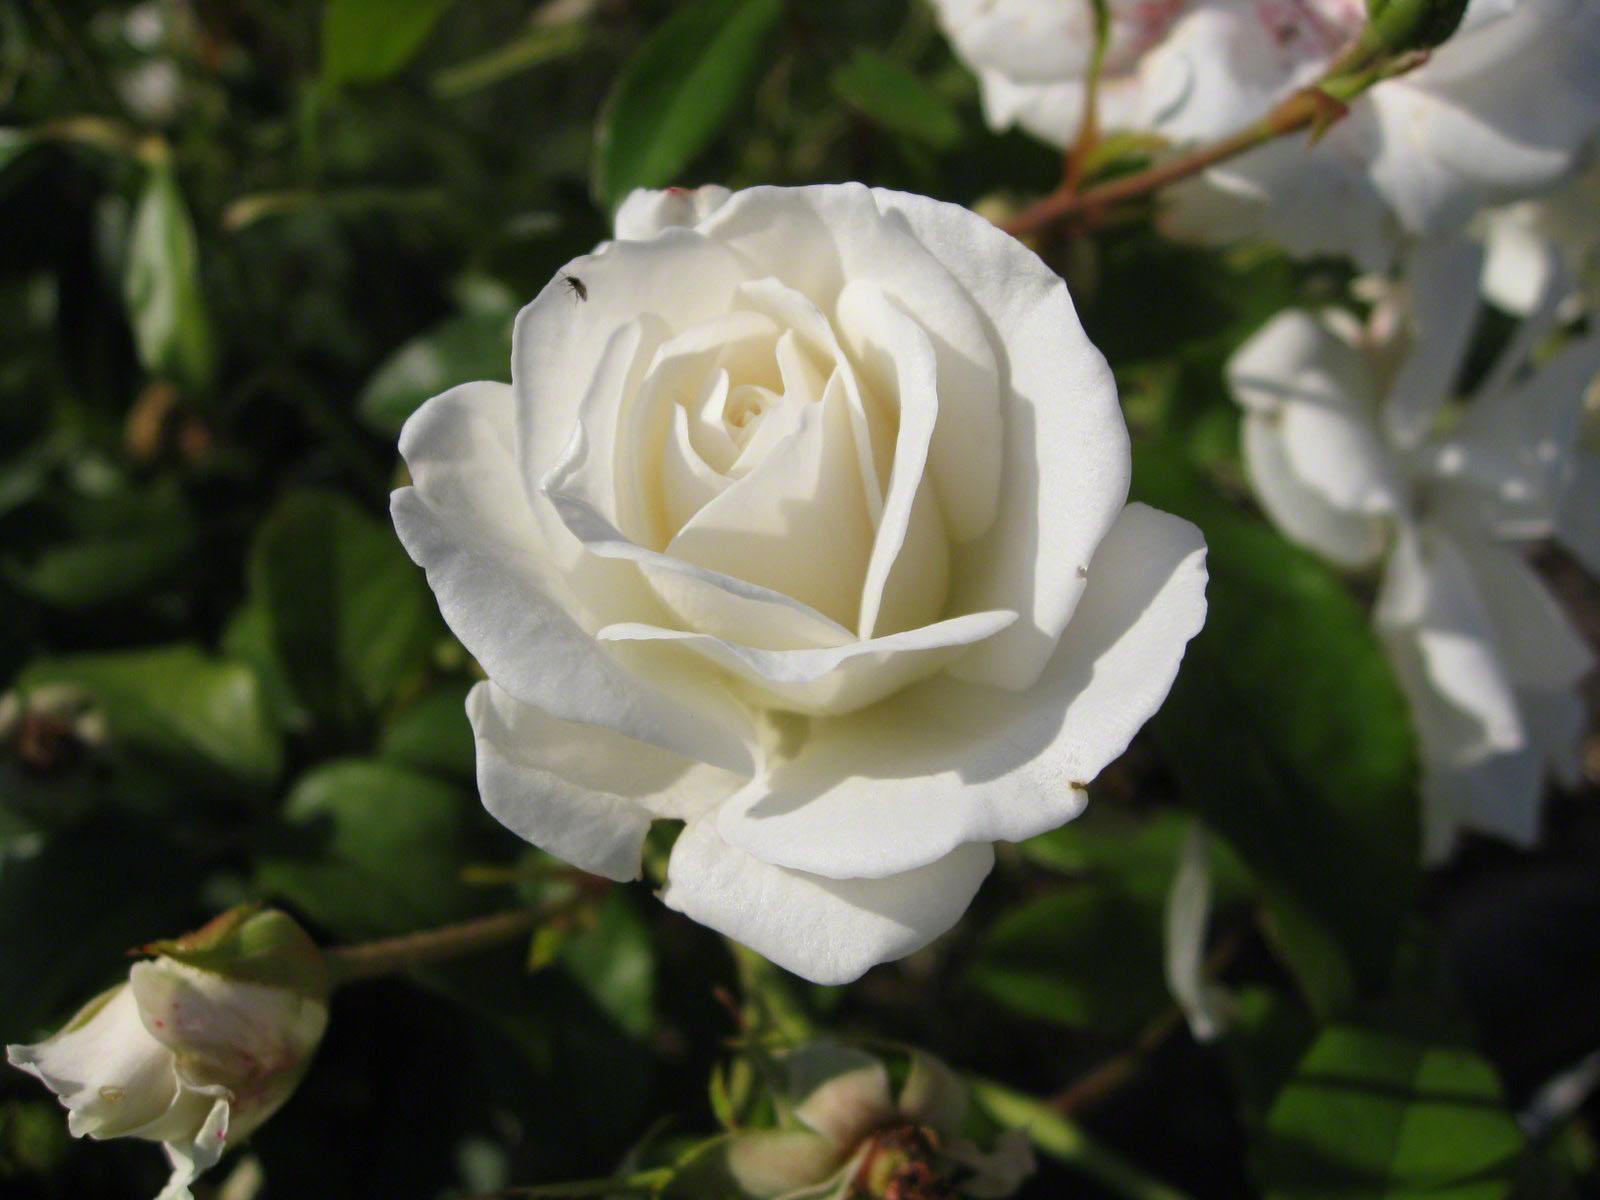 http://www.fabiovisentin.com/photography/photo/12/roses-wallpaper-roses-bouquets4366.JPG